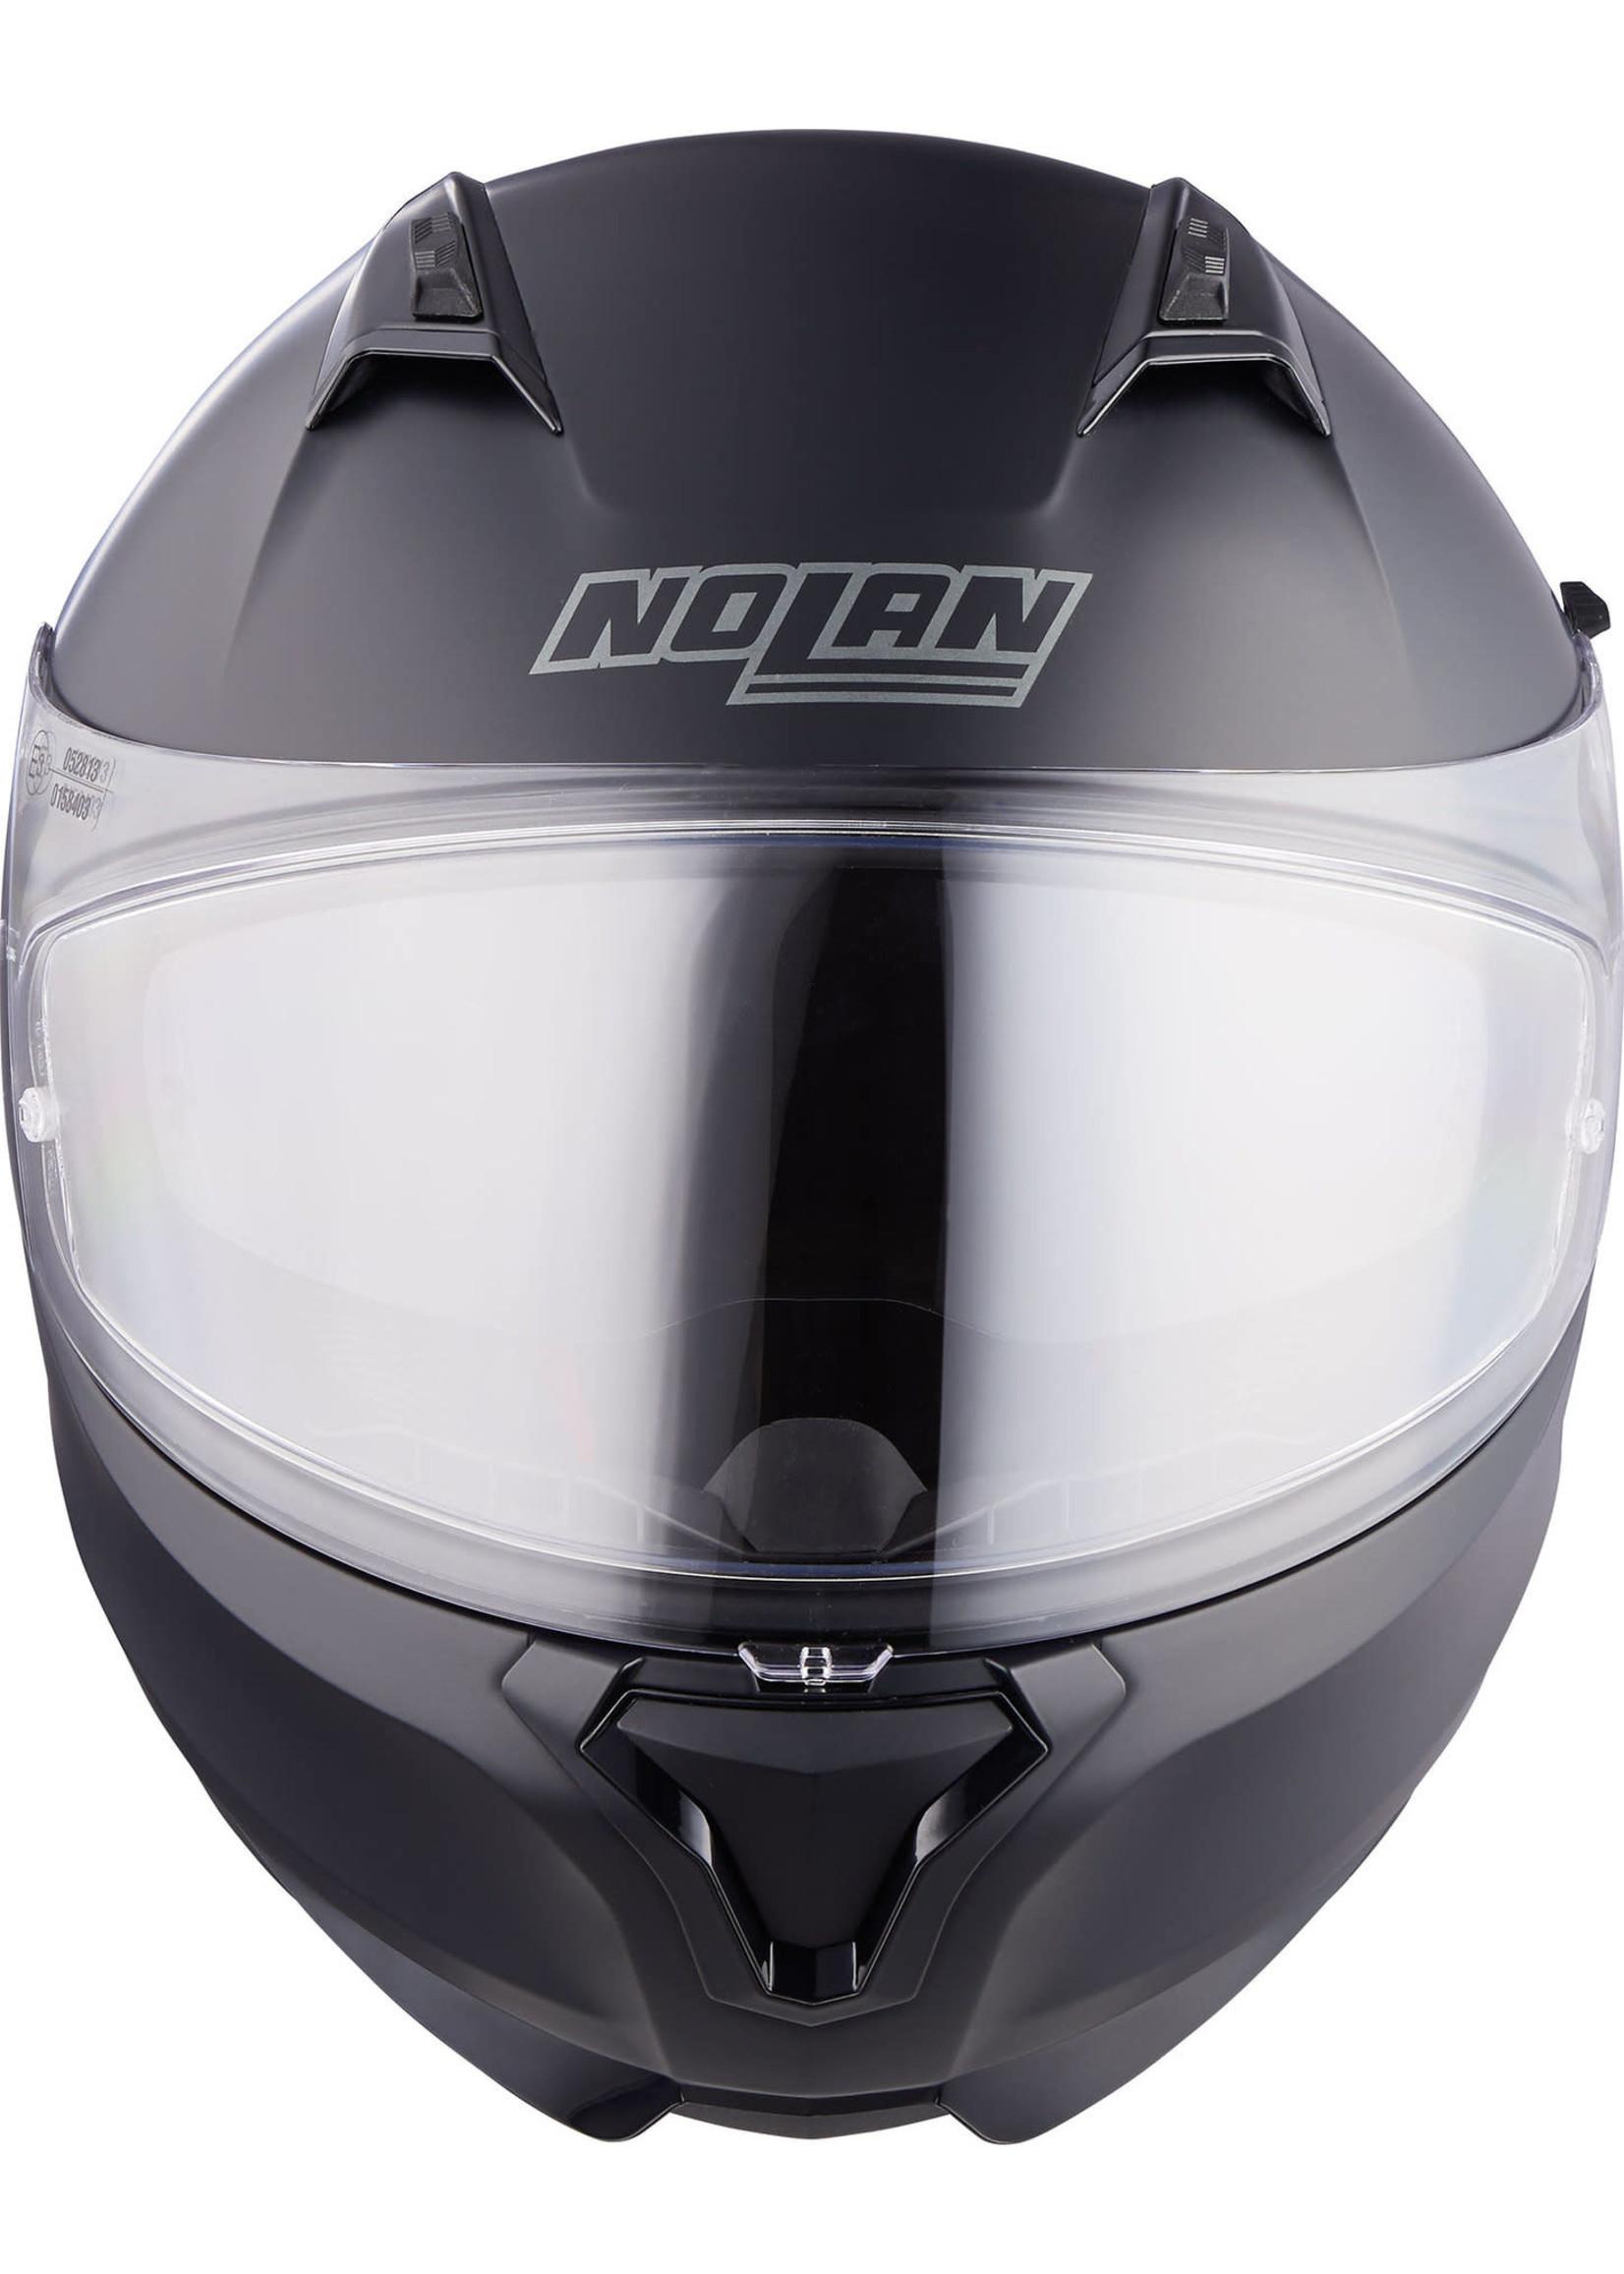 Nolan Nolan N87 CLASSIC 010